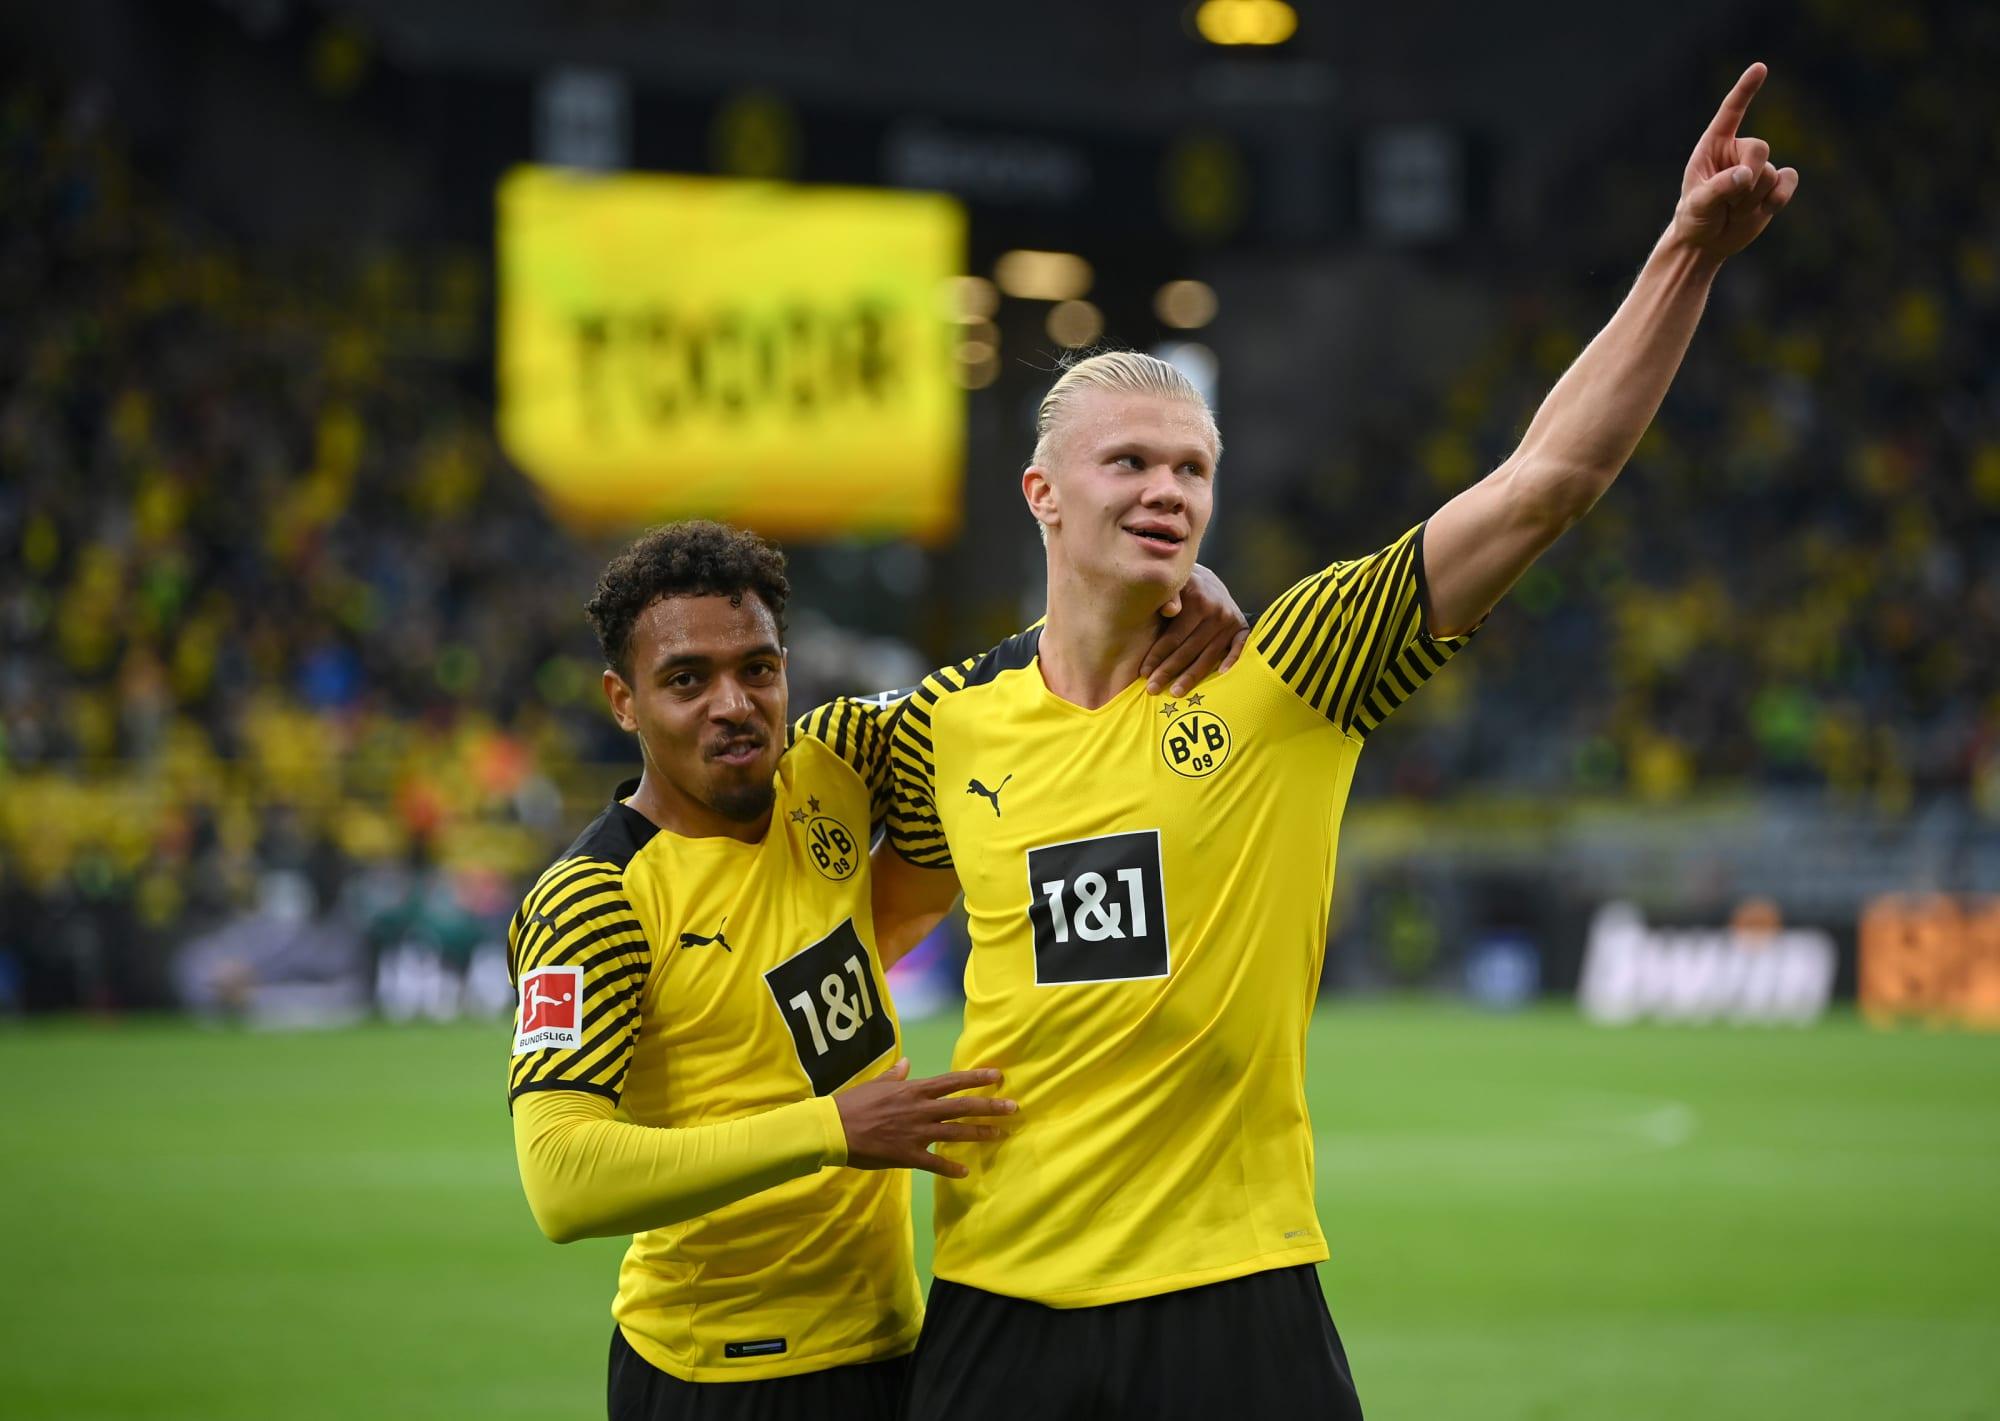 Bundesliga Roundup: Big wins for Borussia Dortmund and Bayern; Woes for RB Leipzig